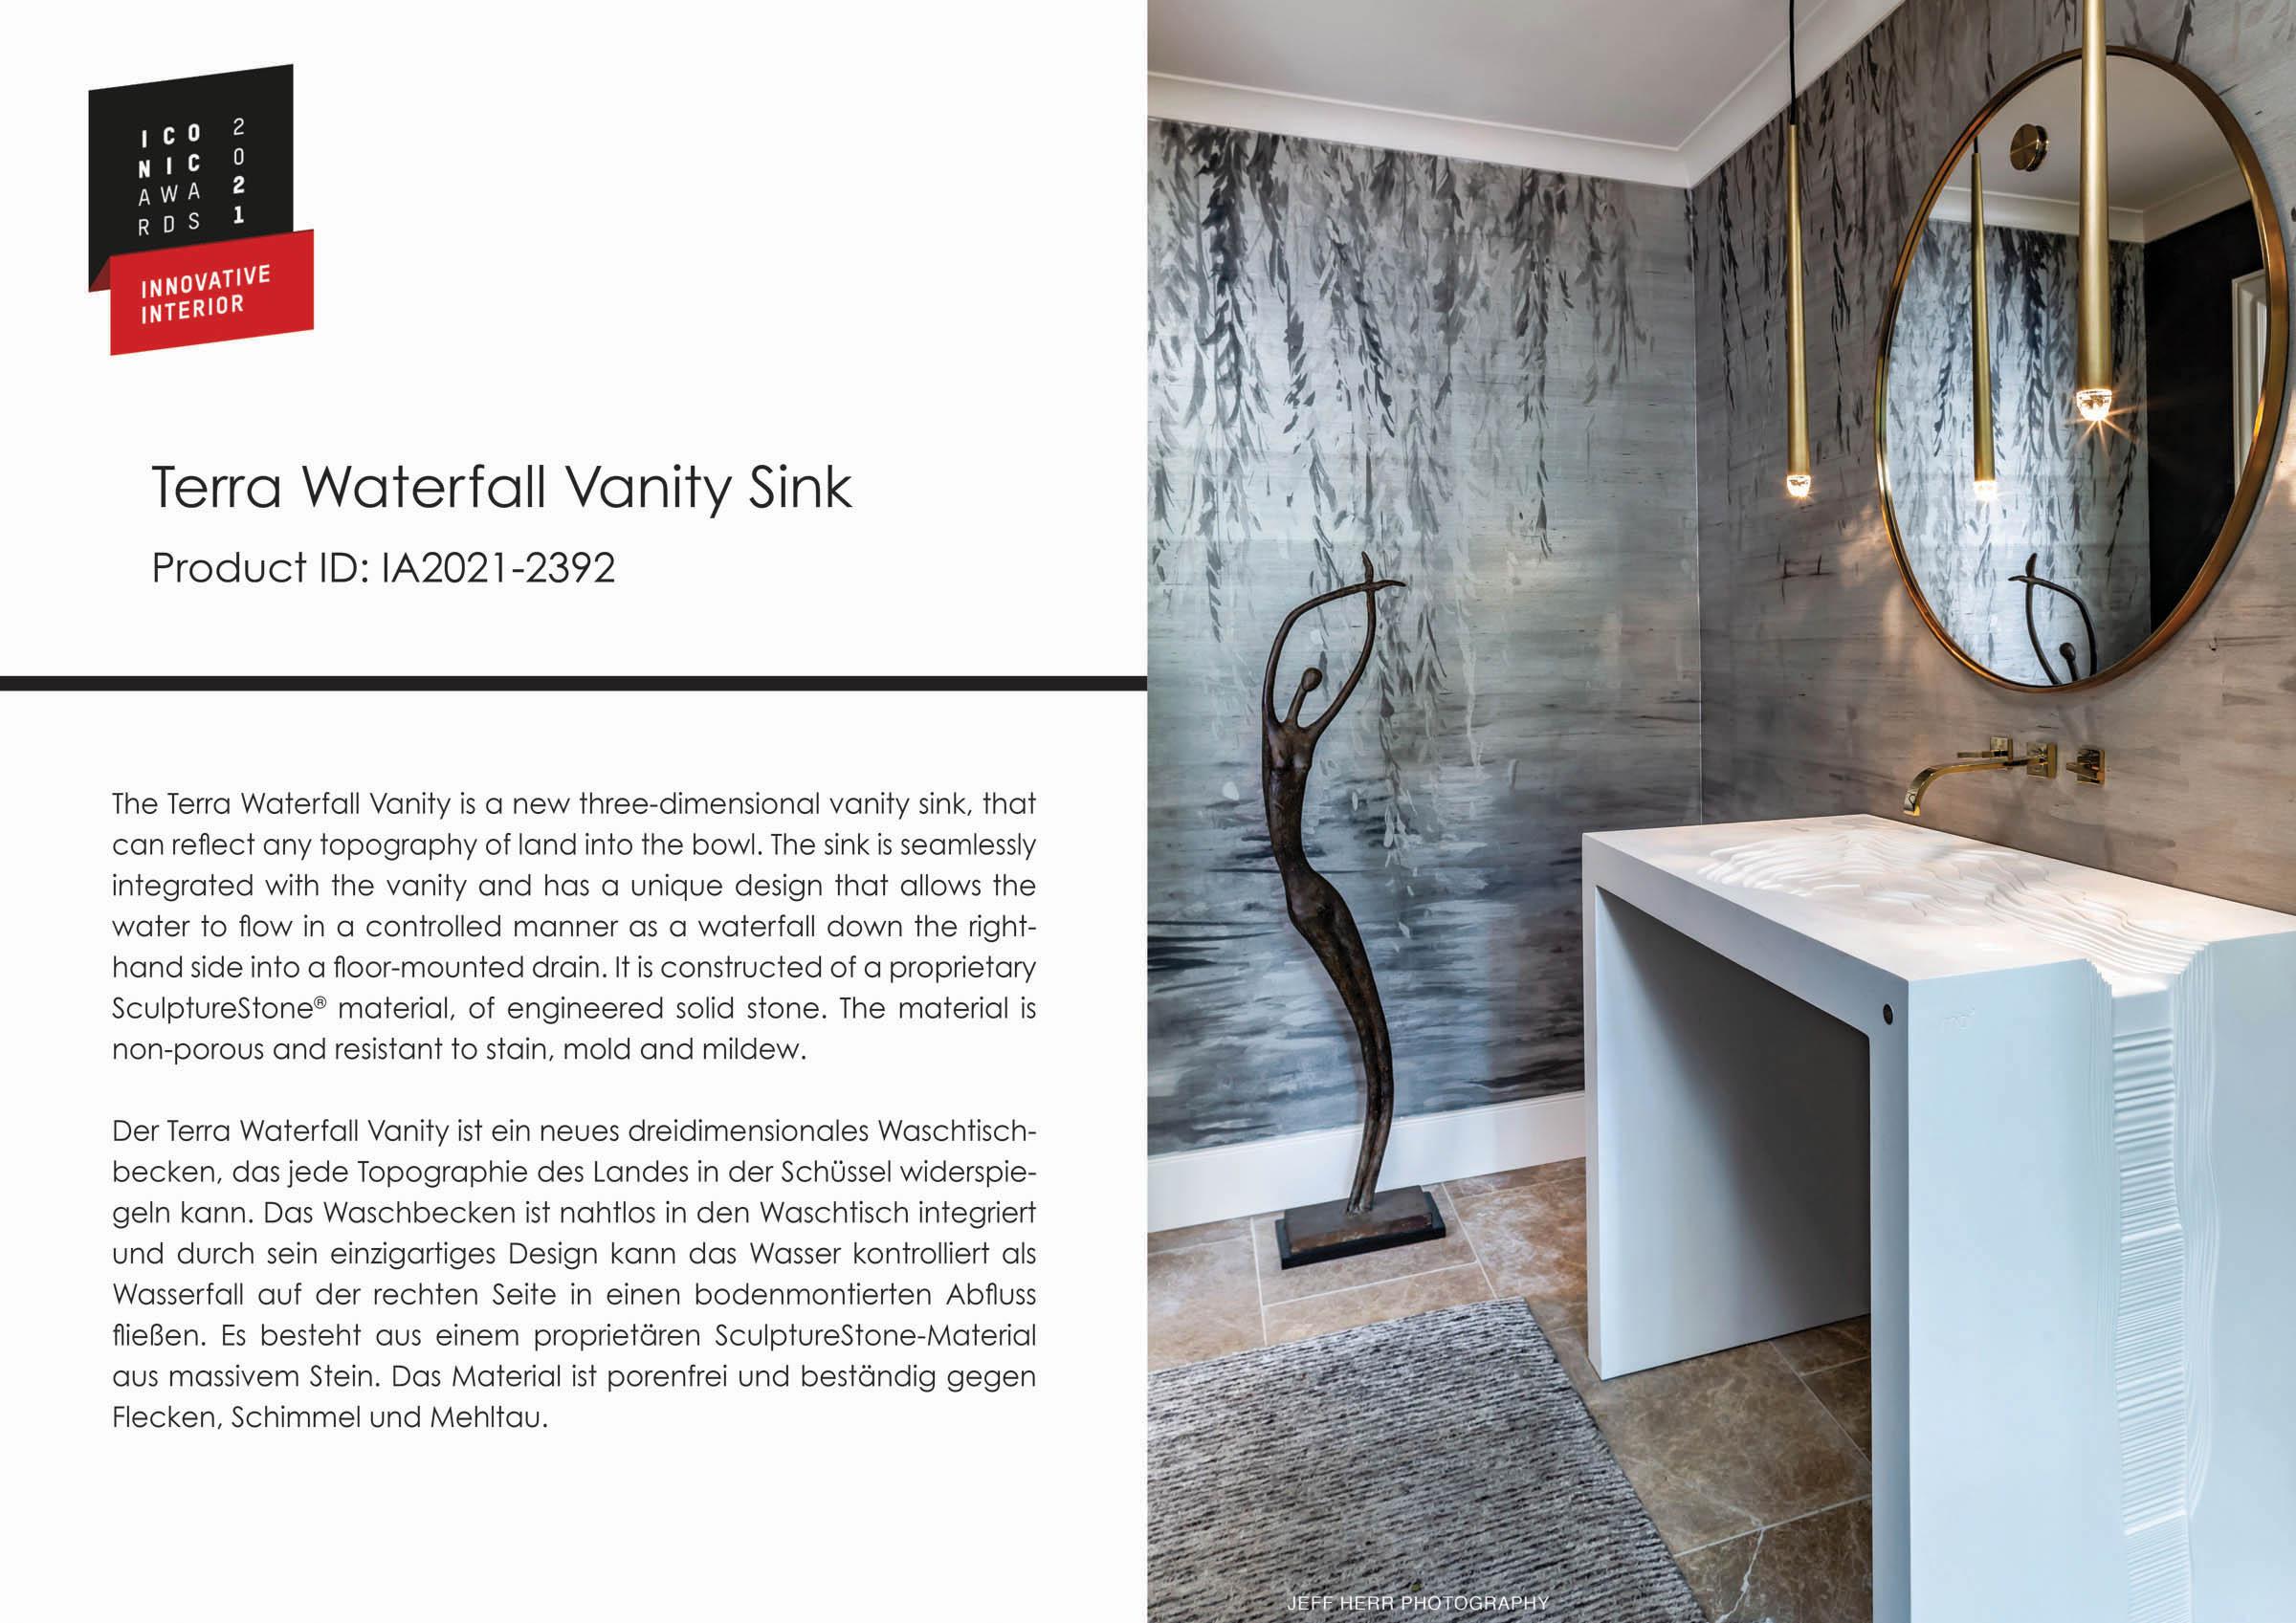 Terra Waterfall Vanity Sink Iconic World